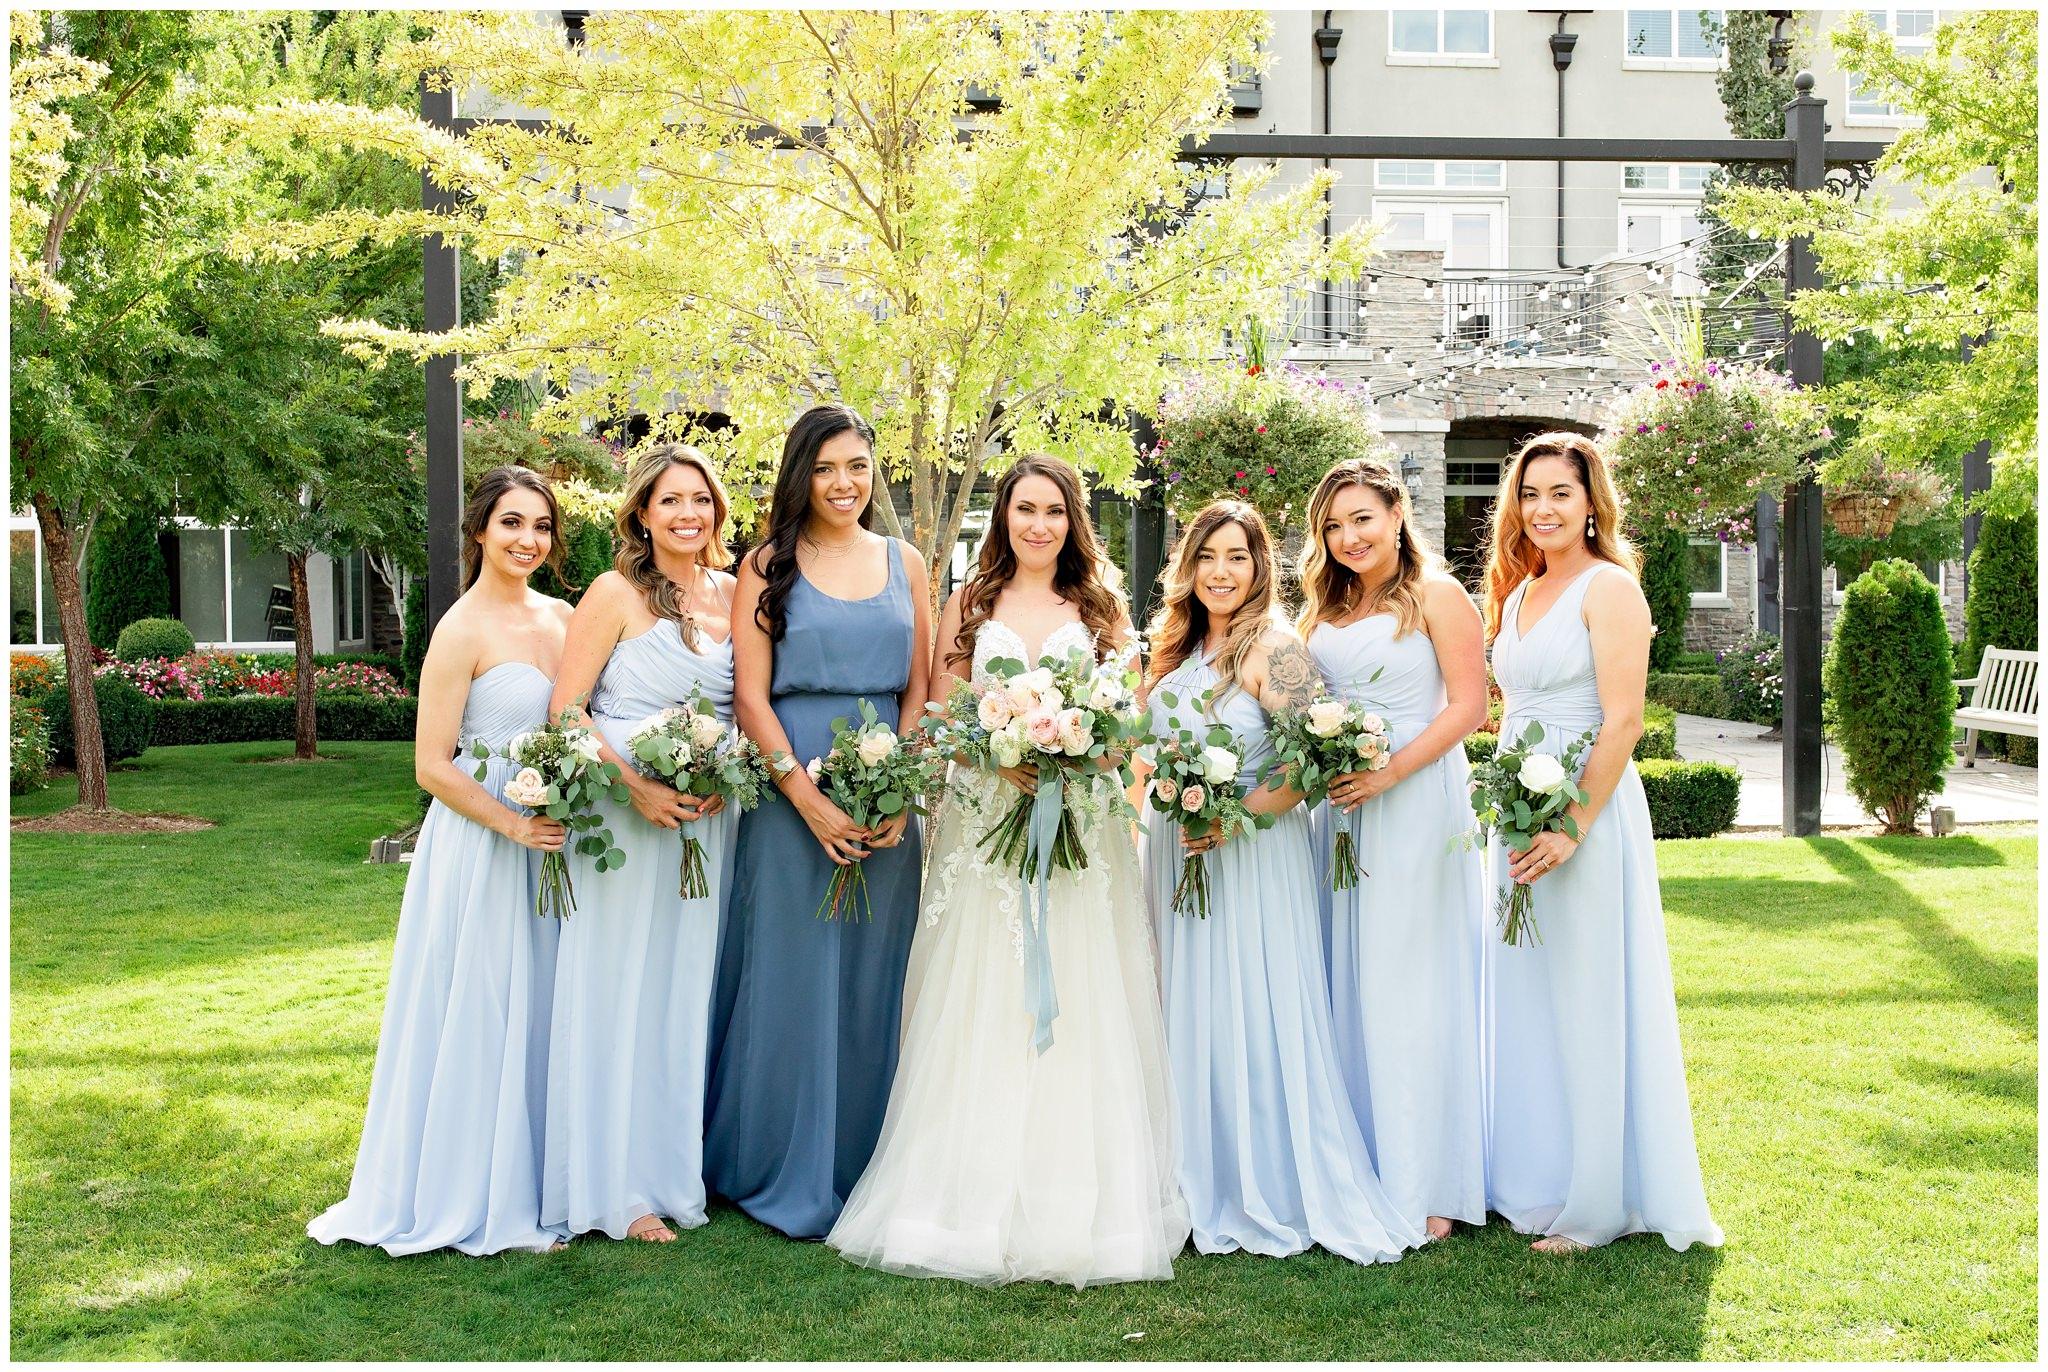 Wedding Party pictures of bridesmaids at Sleepy Ridge